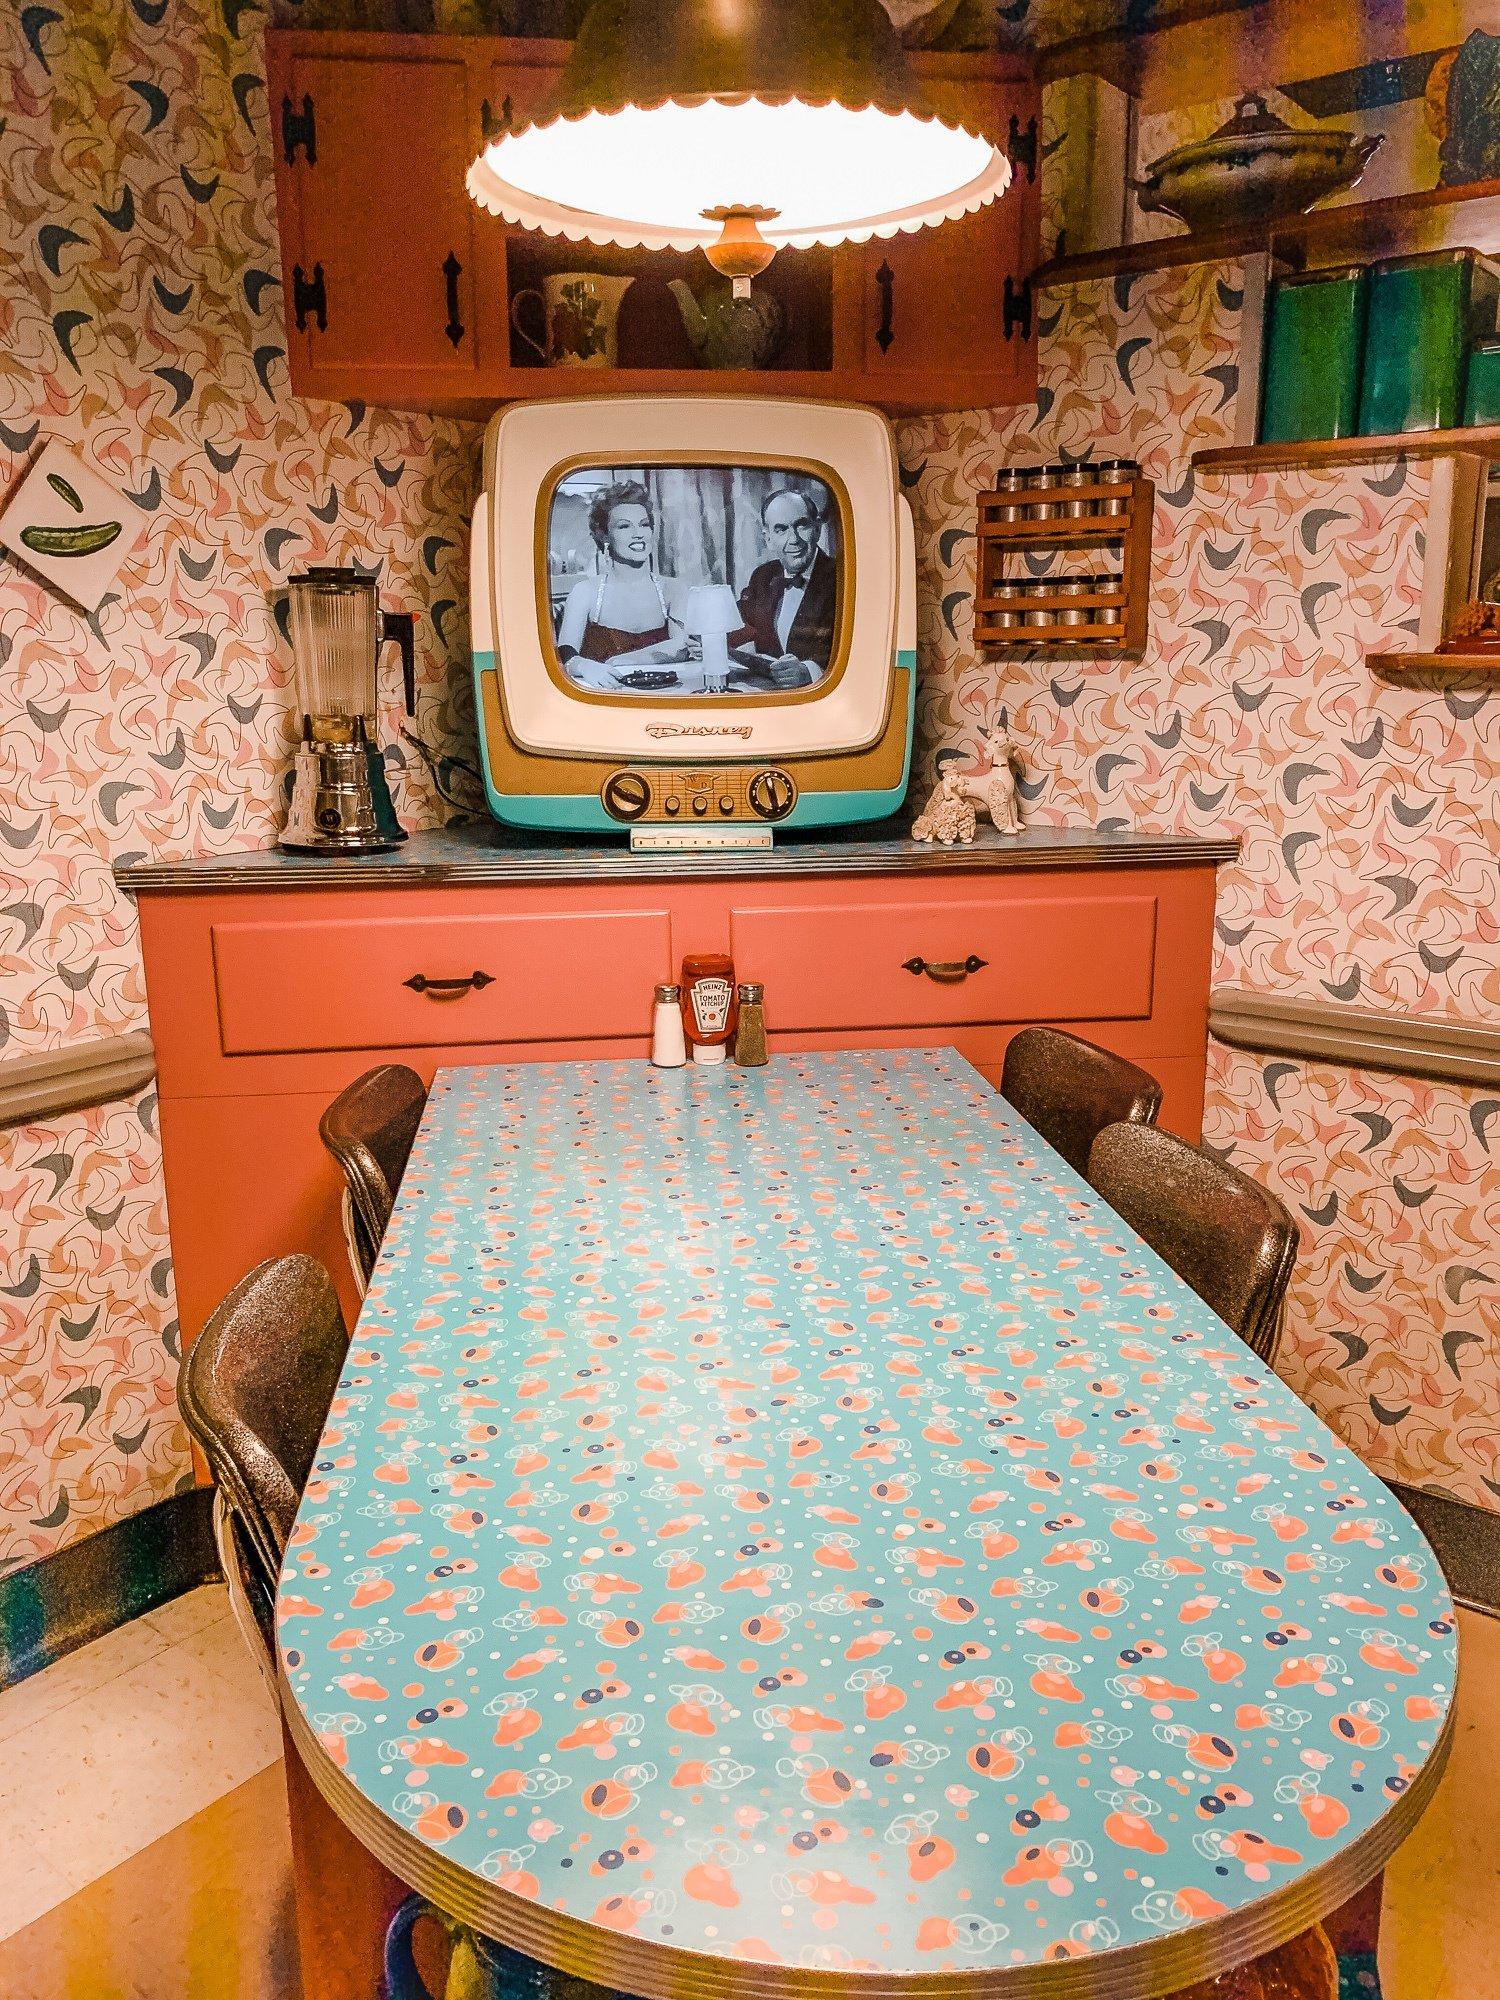 1950's themed Prime Time Café at Disney's Hollywood Studios